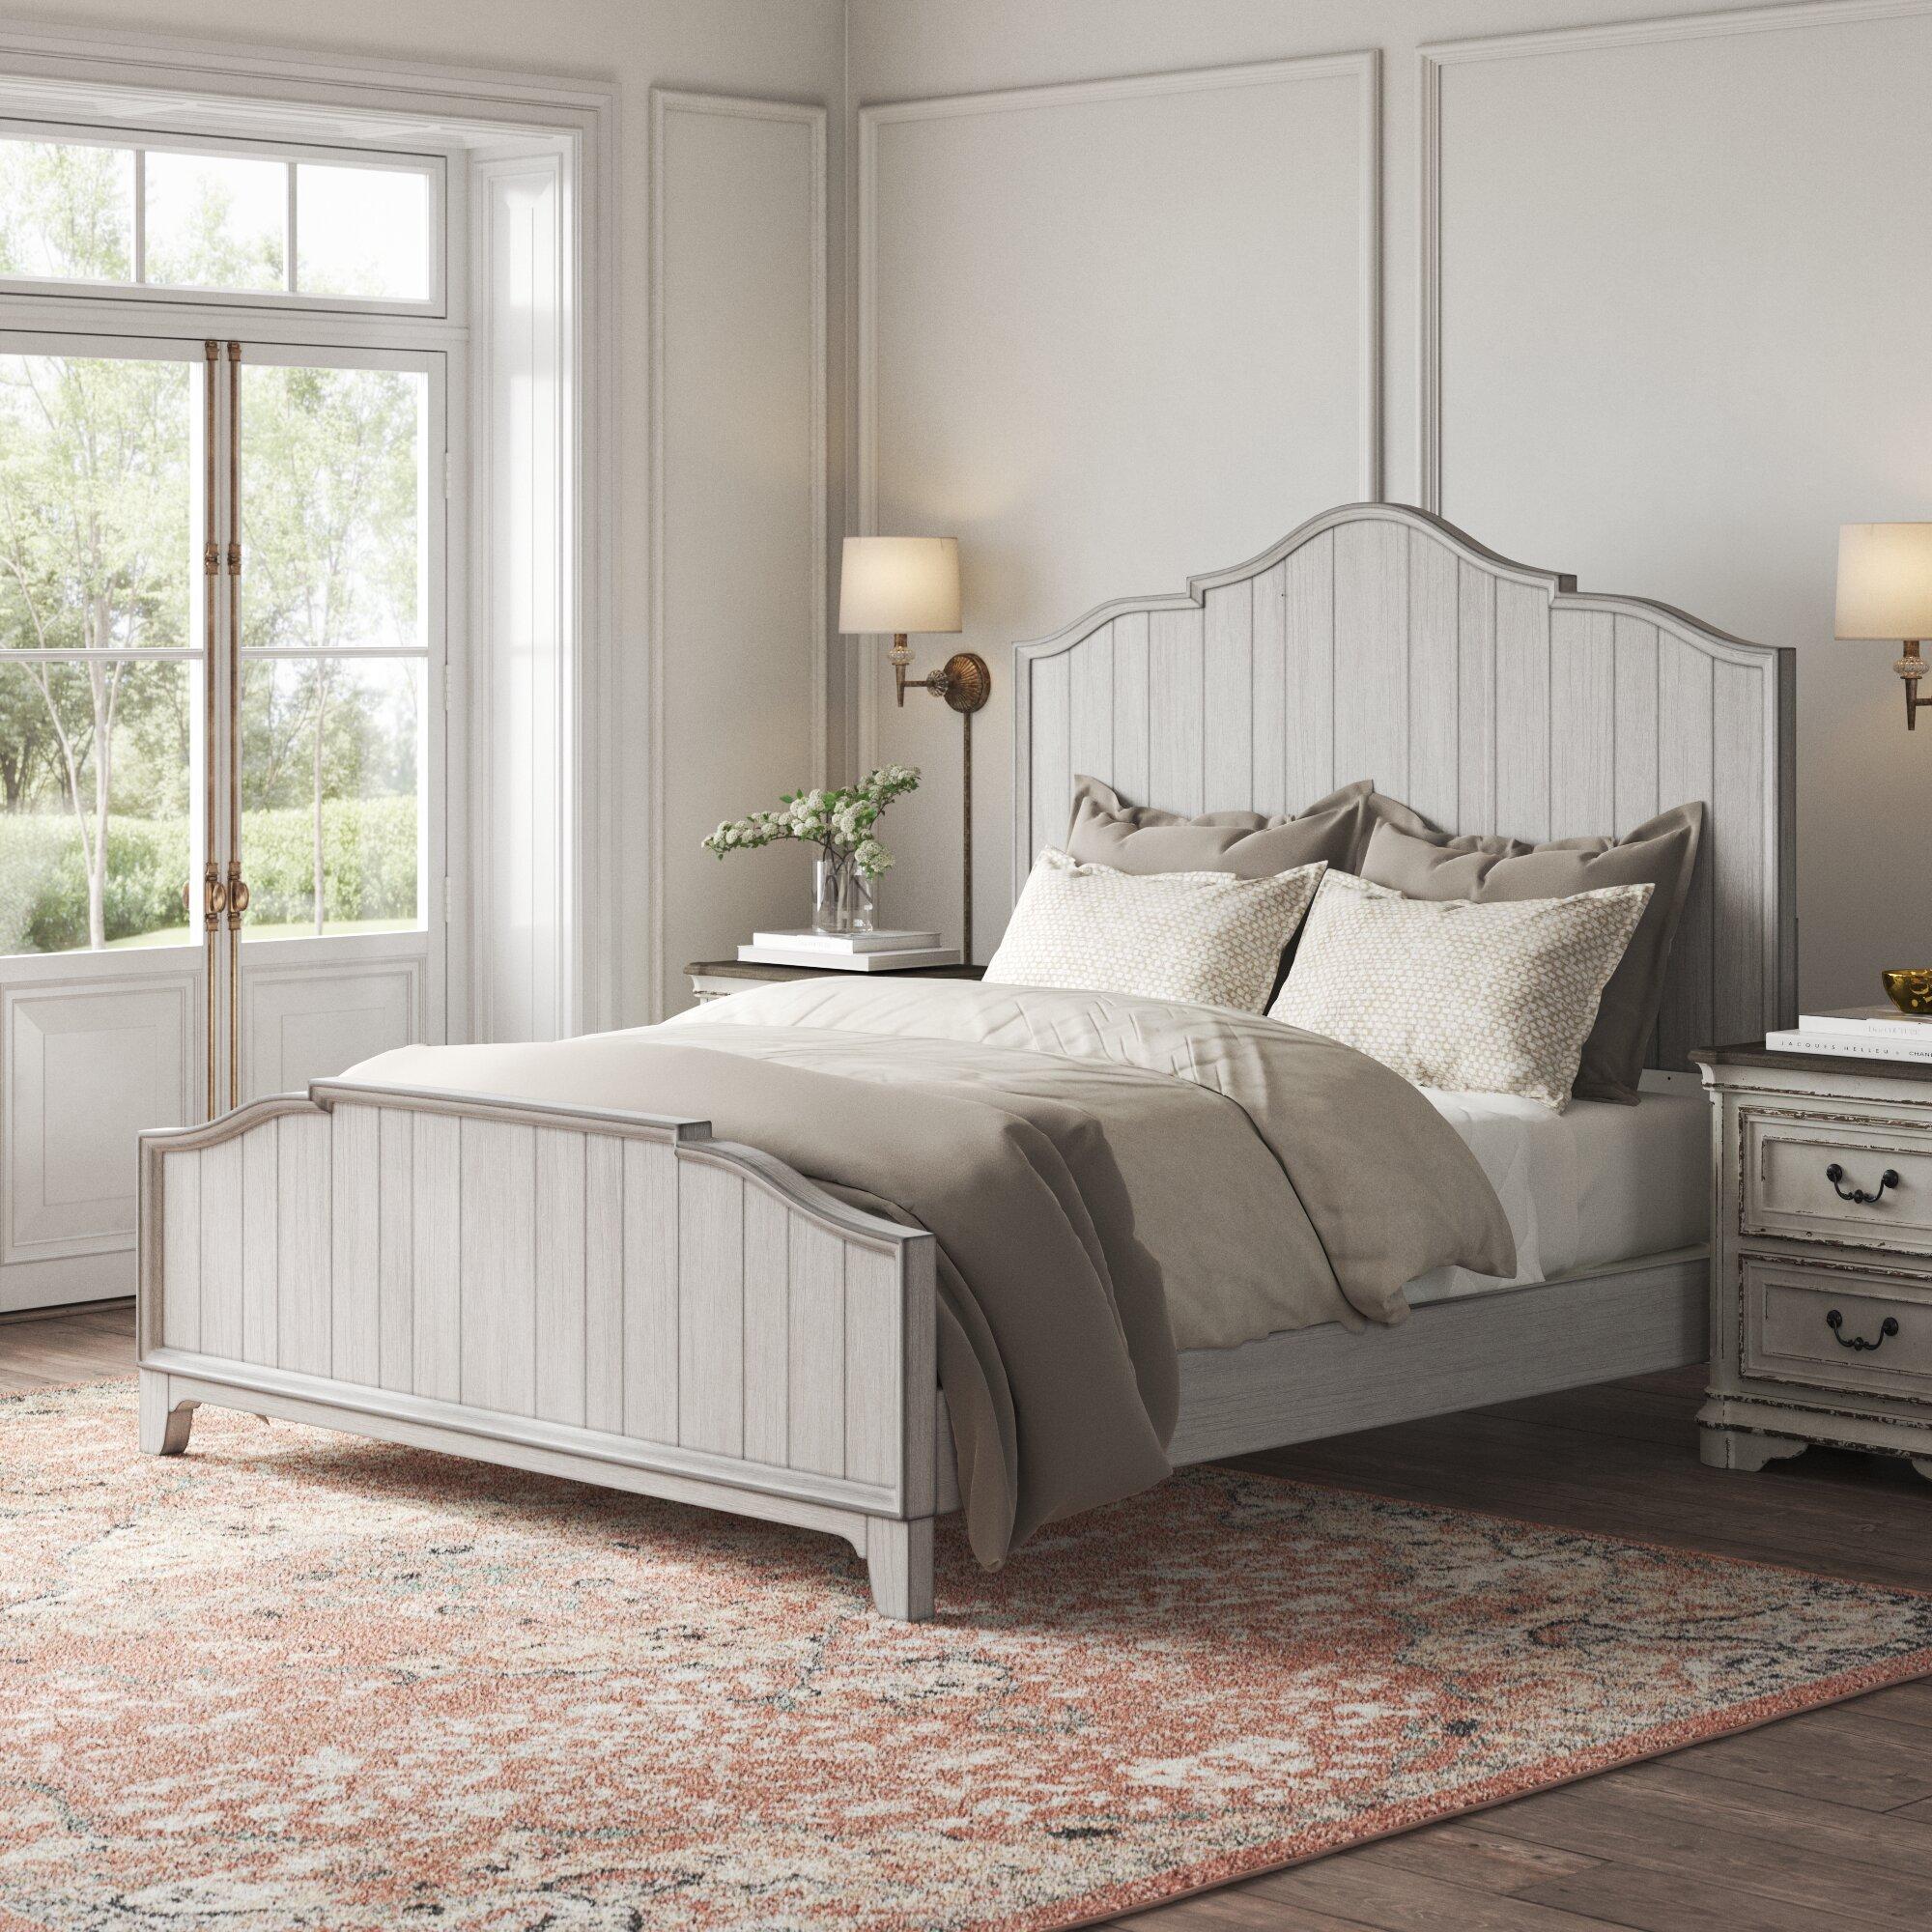 Kelly Clarkson Home Servier Standard Configurable Bedroom Set